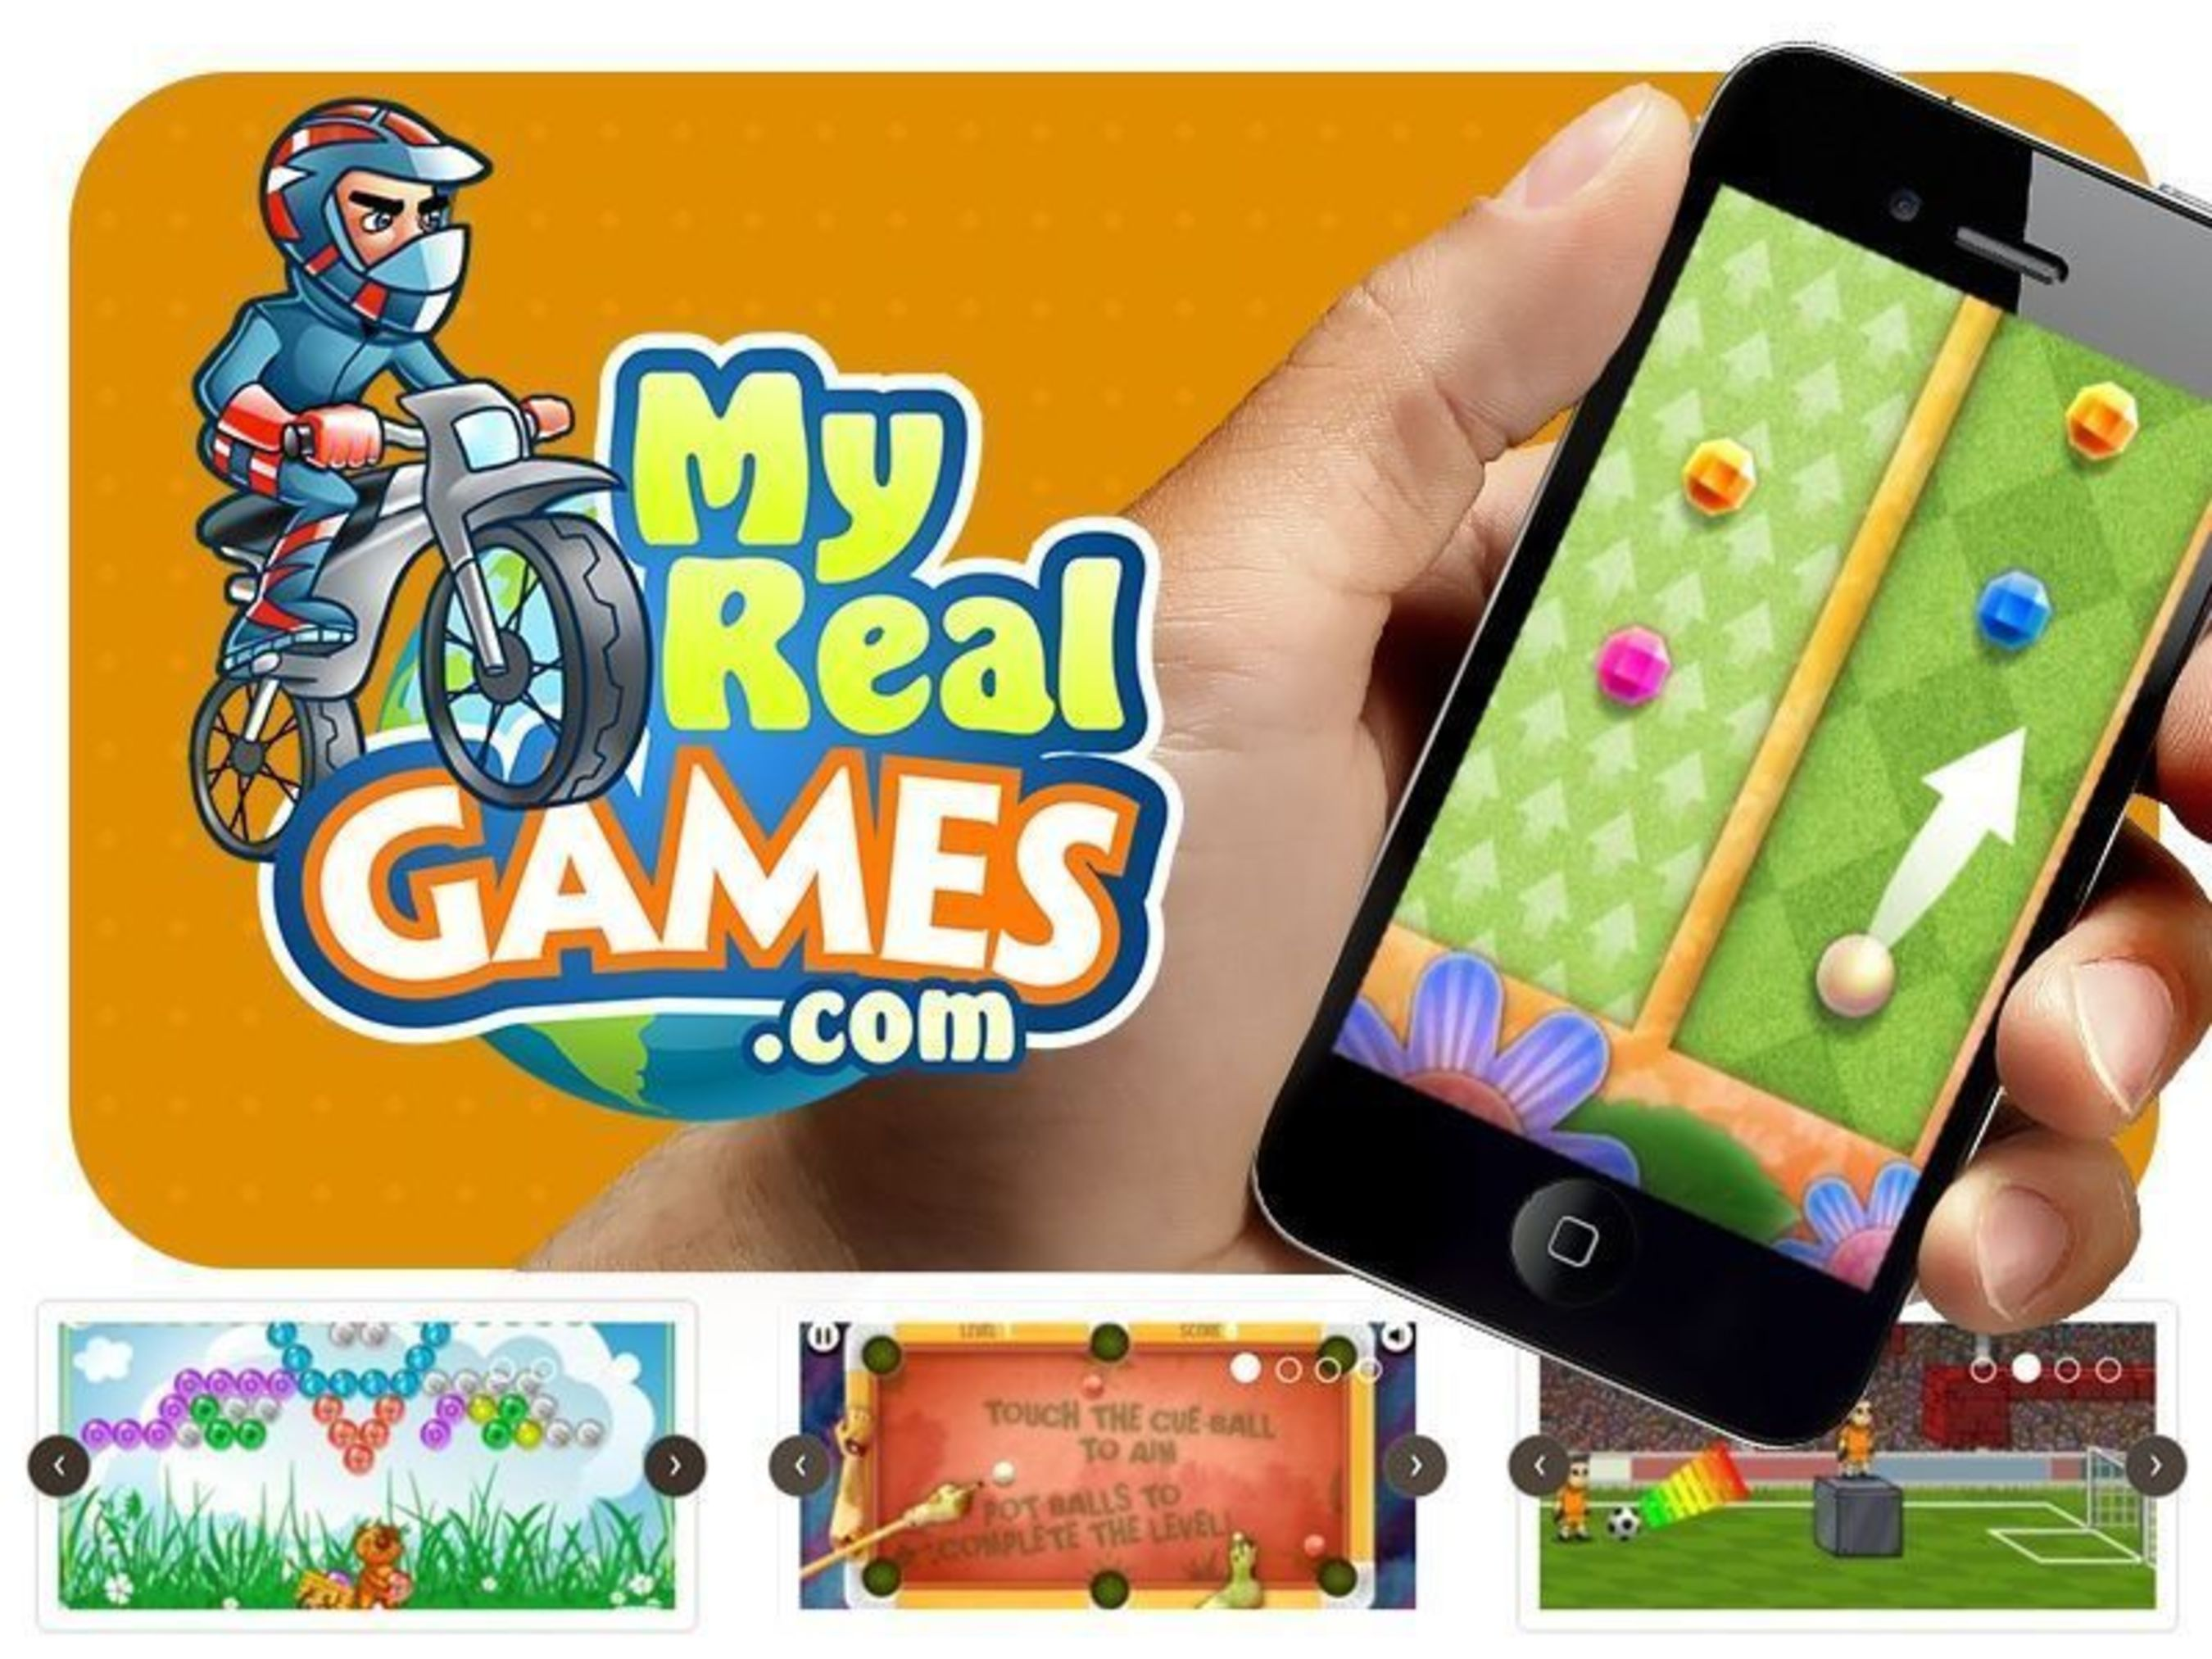 Mobile Online Games for Android, iPad and iPhone at MyRealGames (PRNewsFoto/MyRealGames_com)